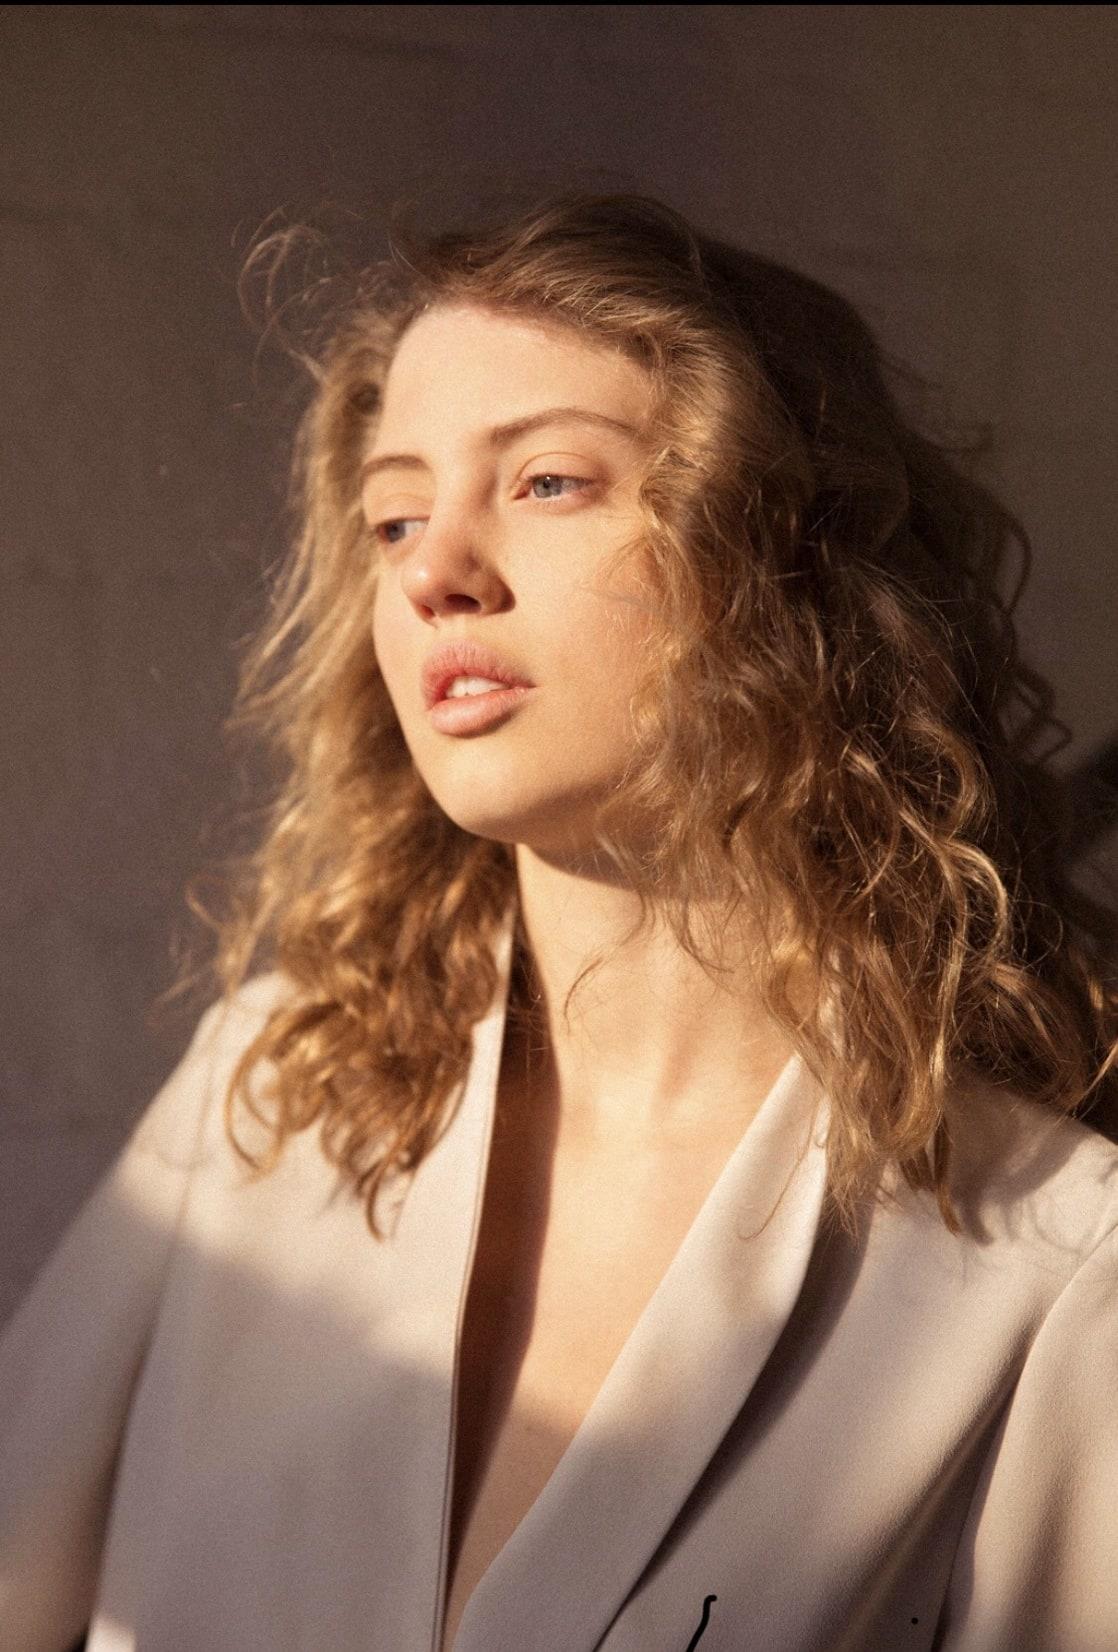 amelia clarkson actress